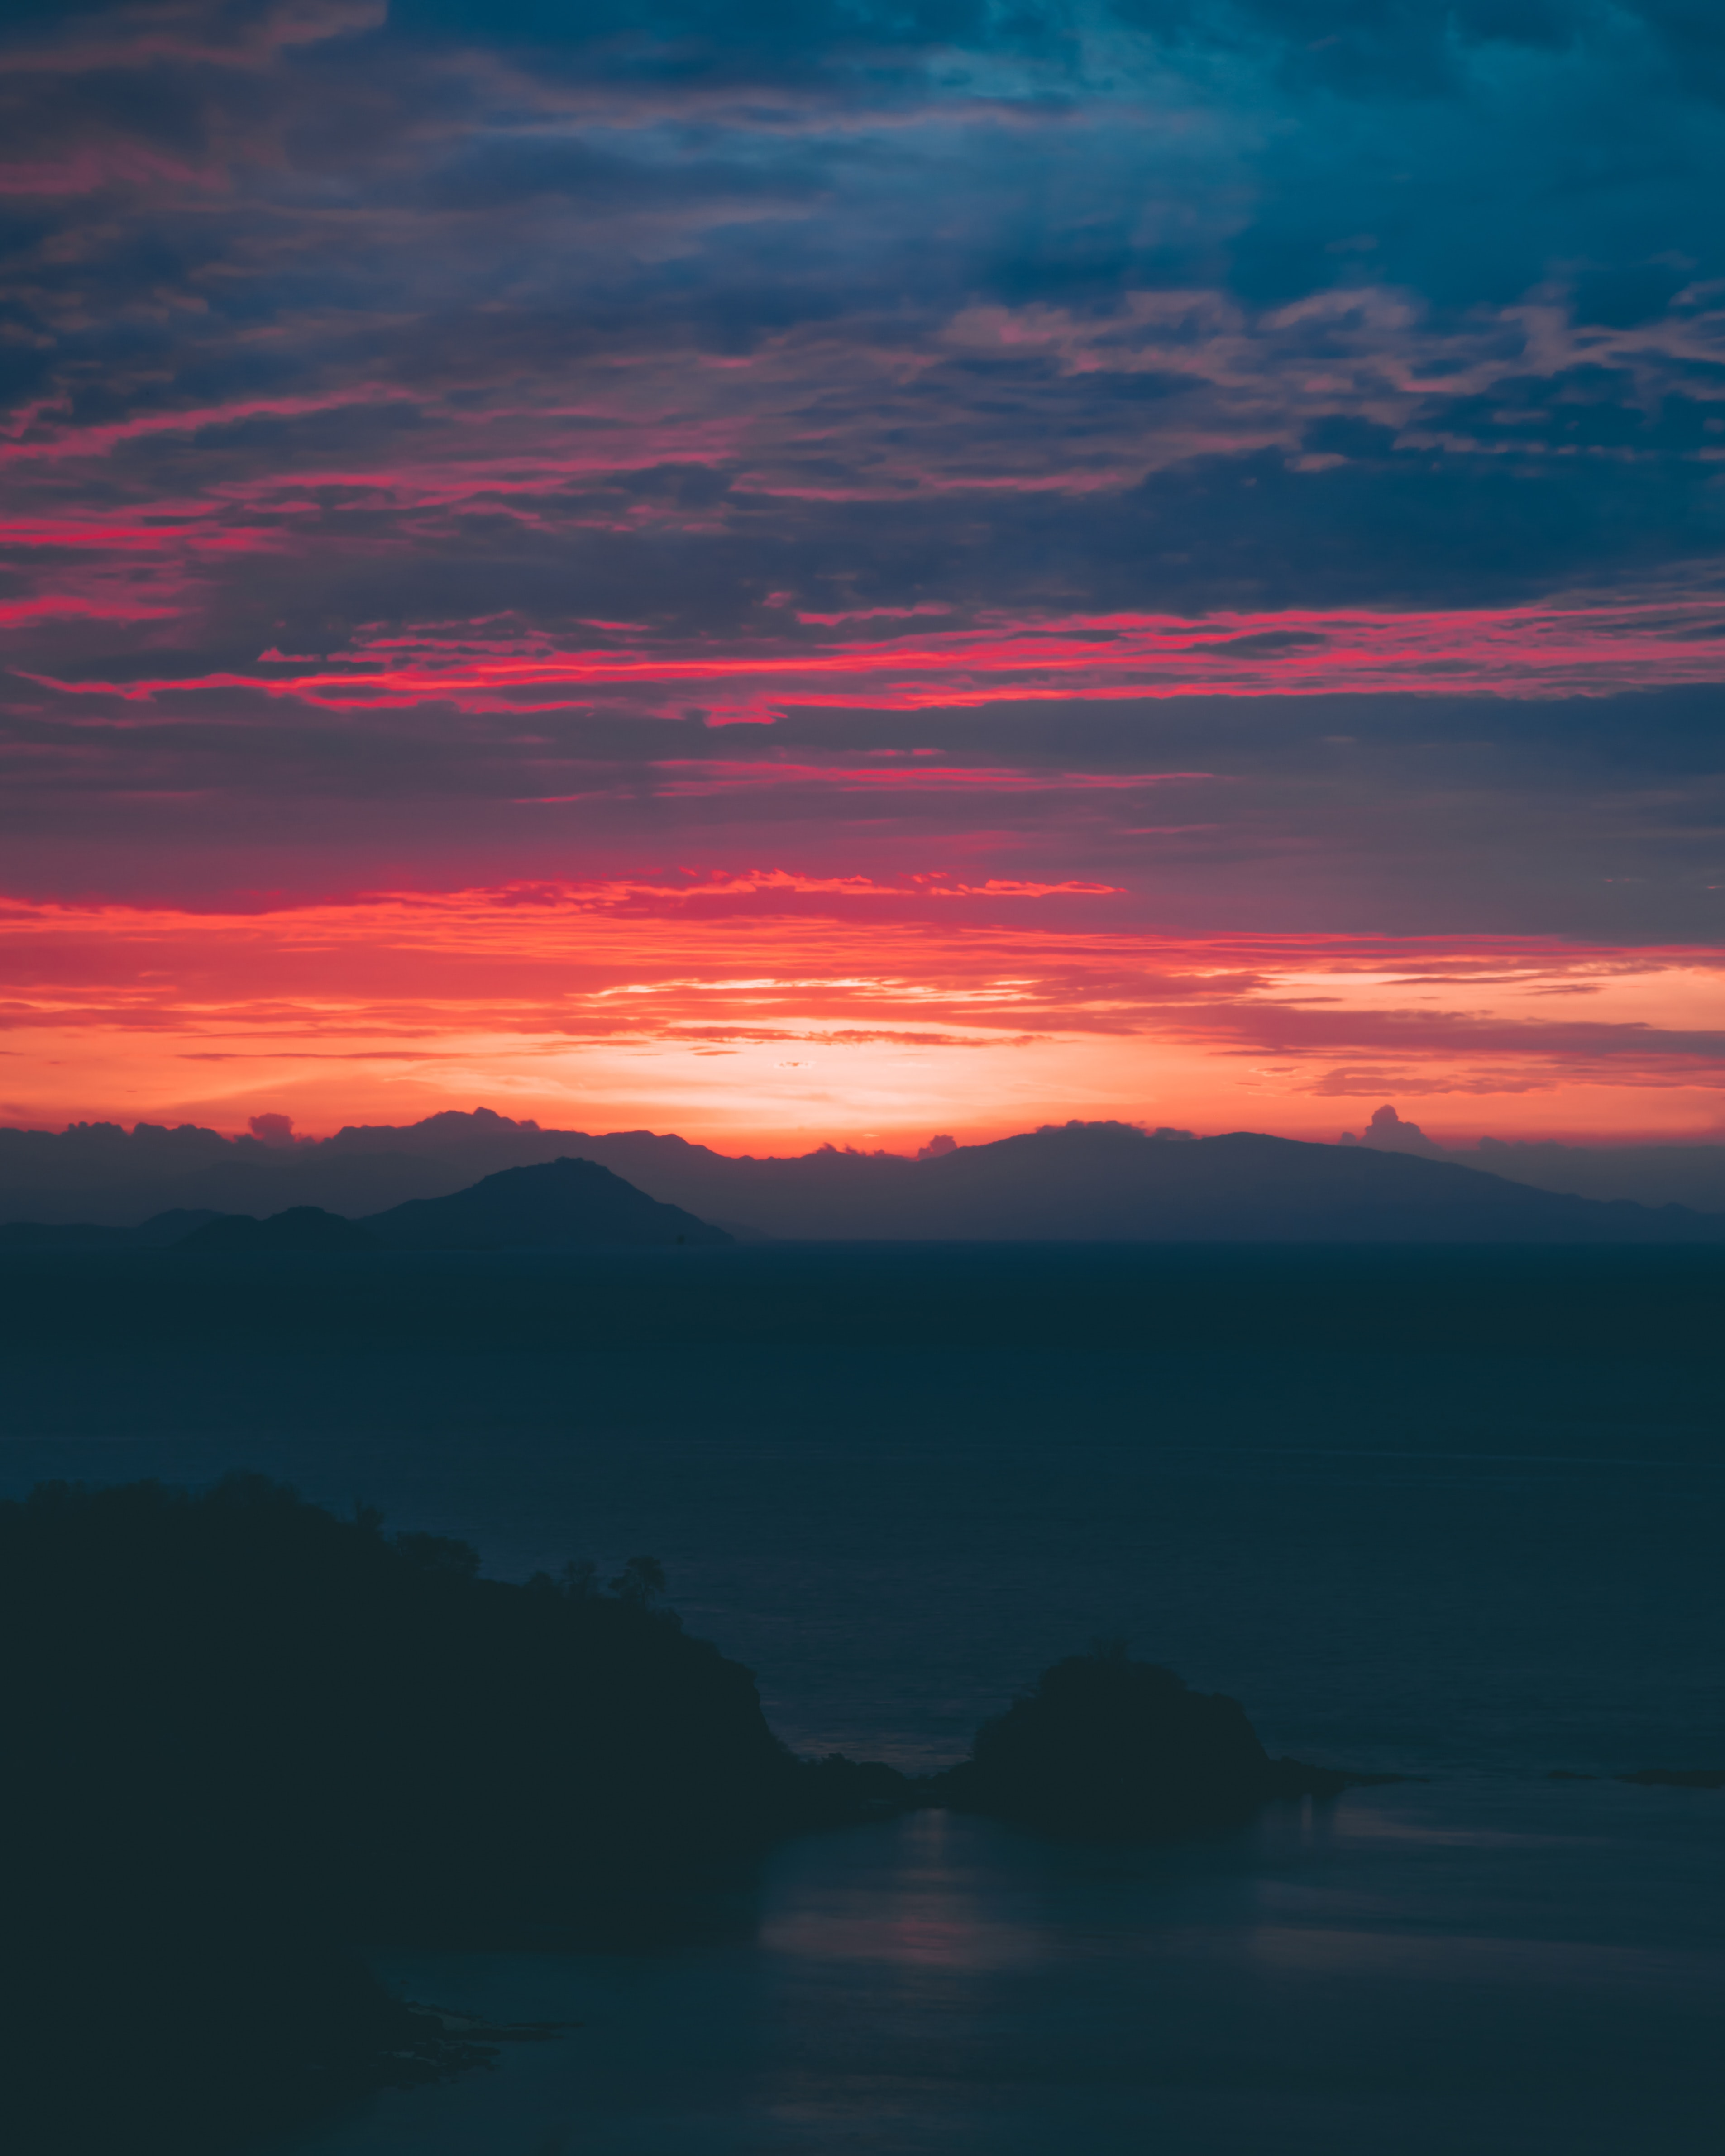 golden hour photo of mountain ranges